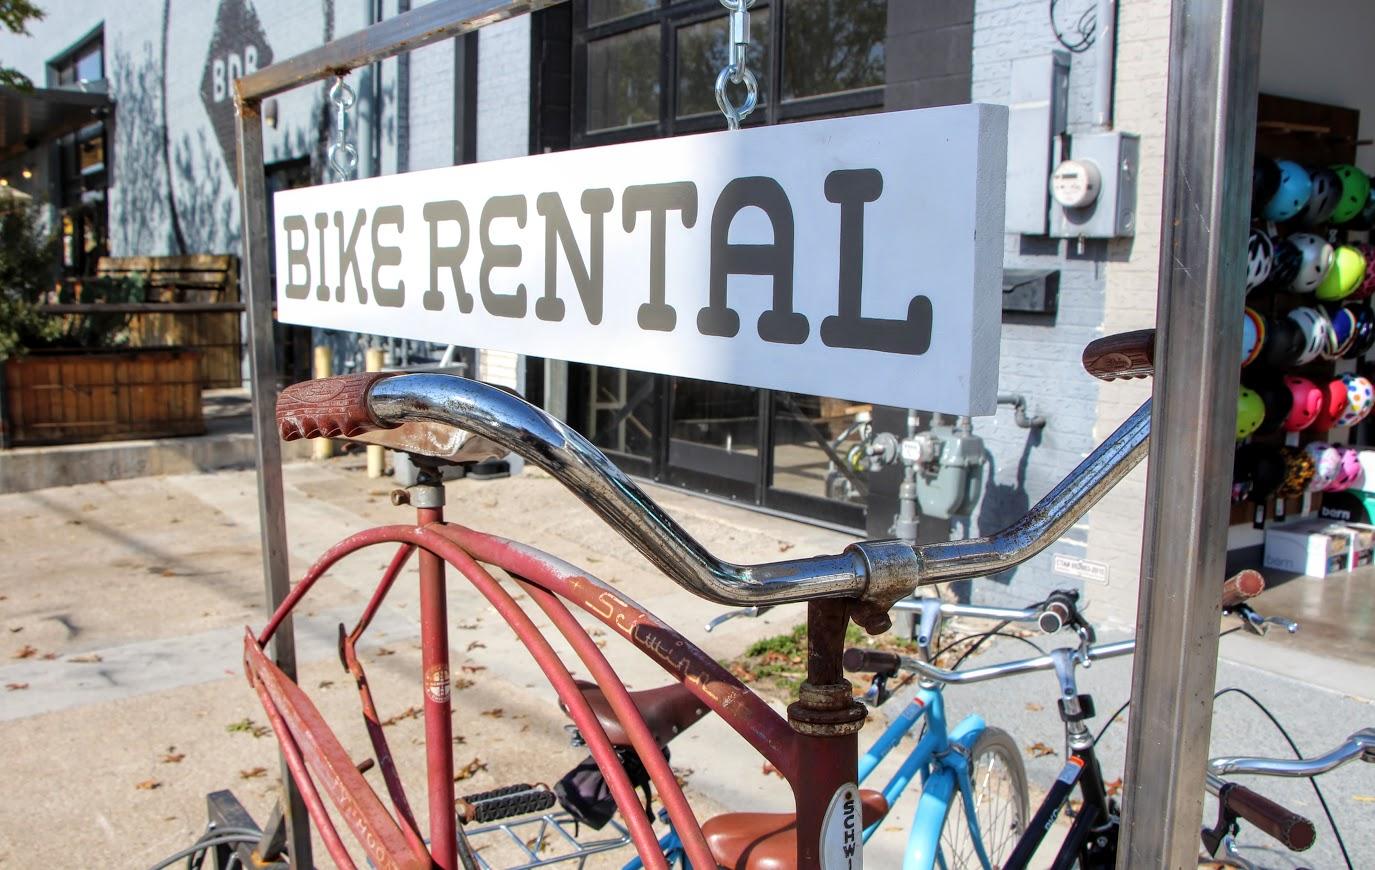 bike-rental-software-1